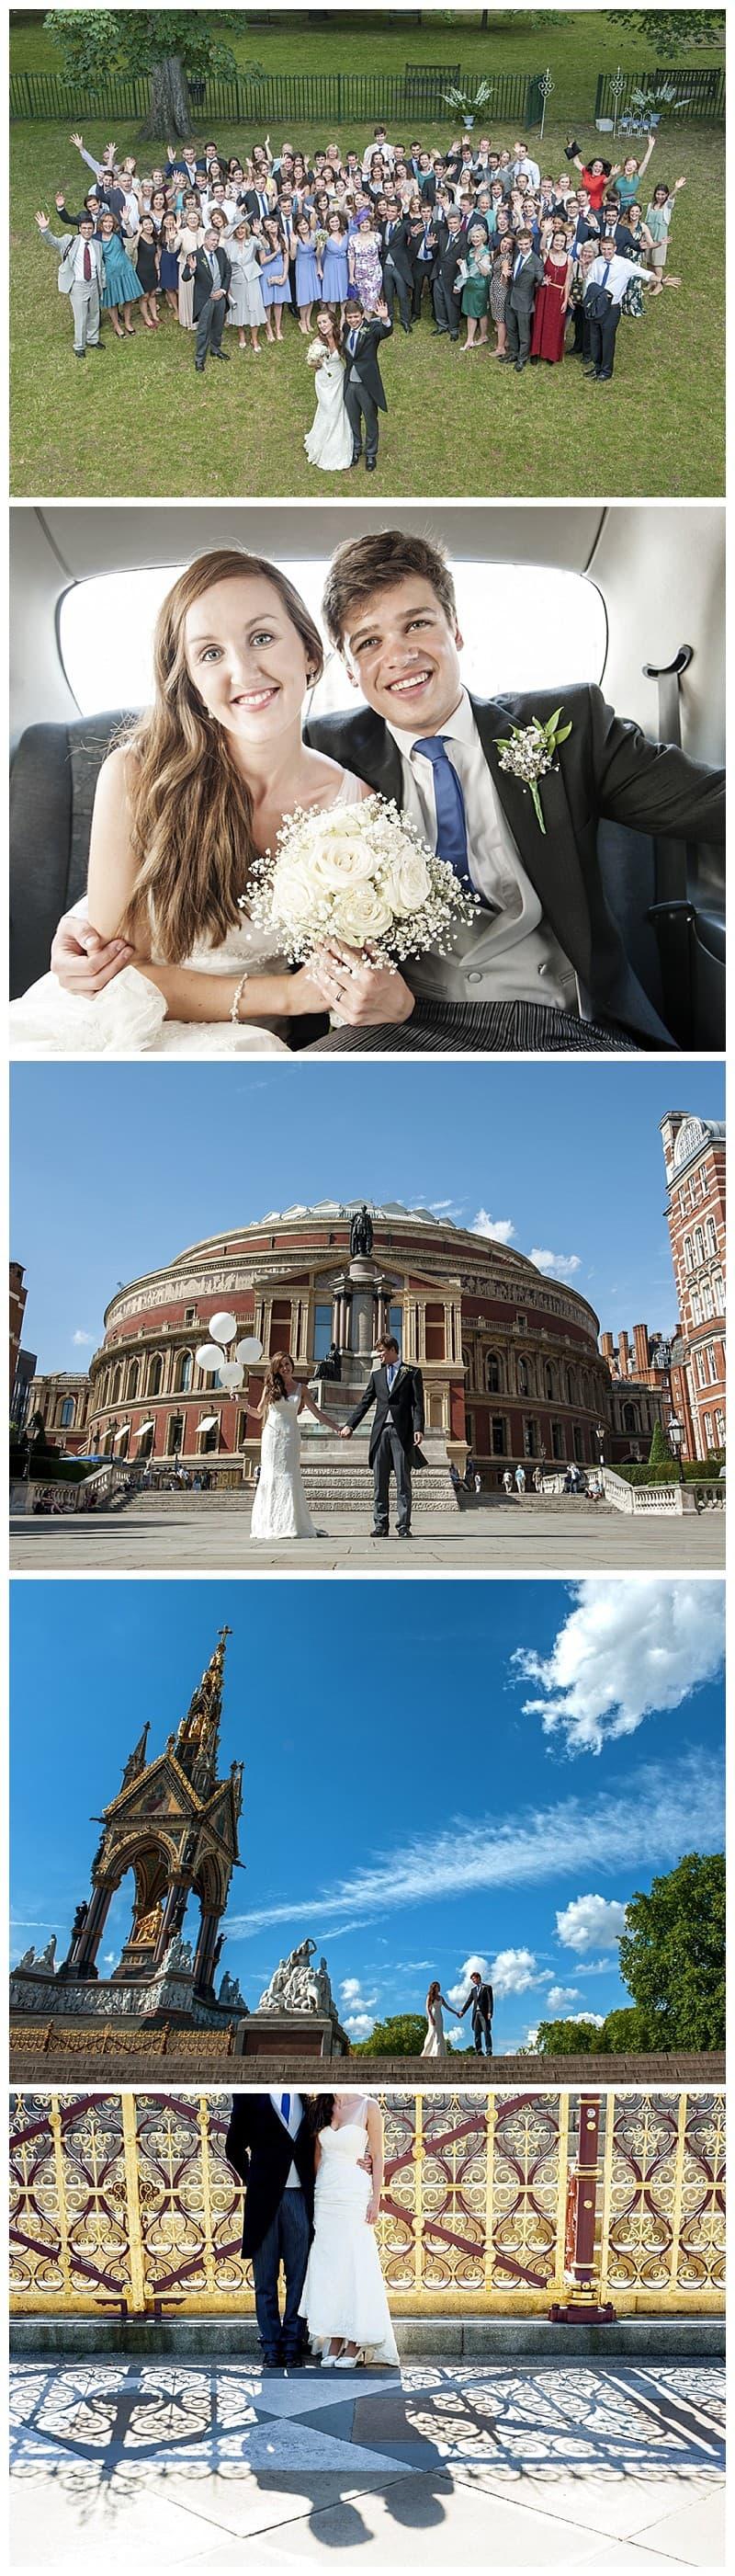 Dan & Rachel, Hyde Park, Kensington Wedding, Benjamin Wetherall Photography0031